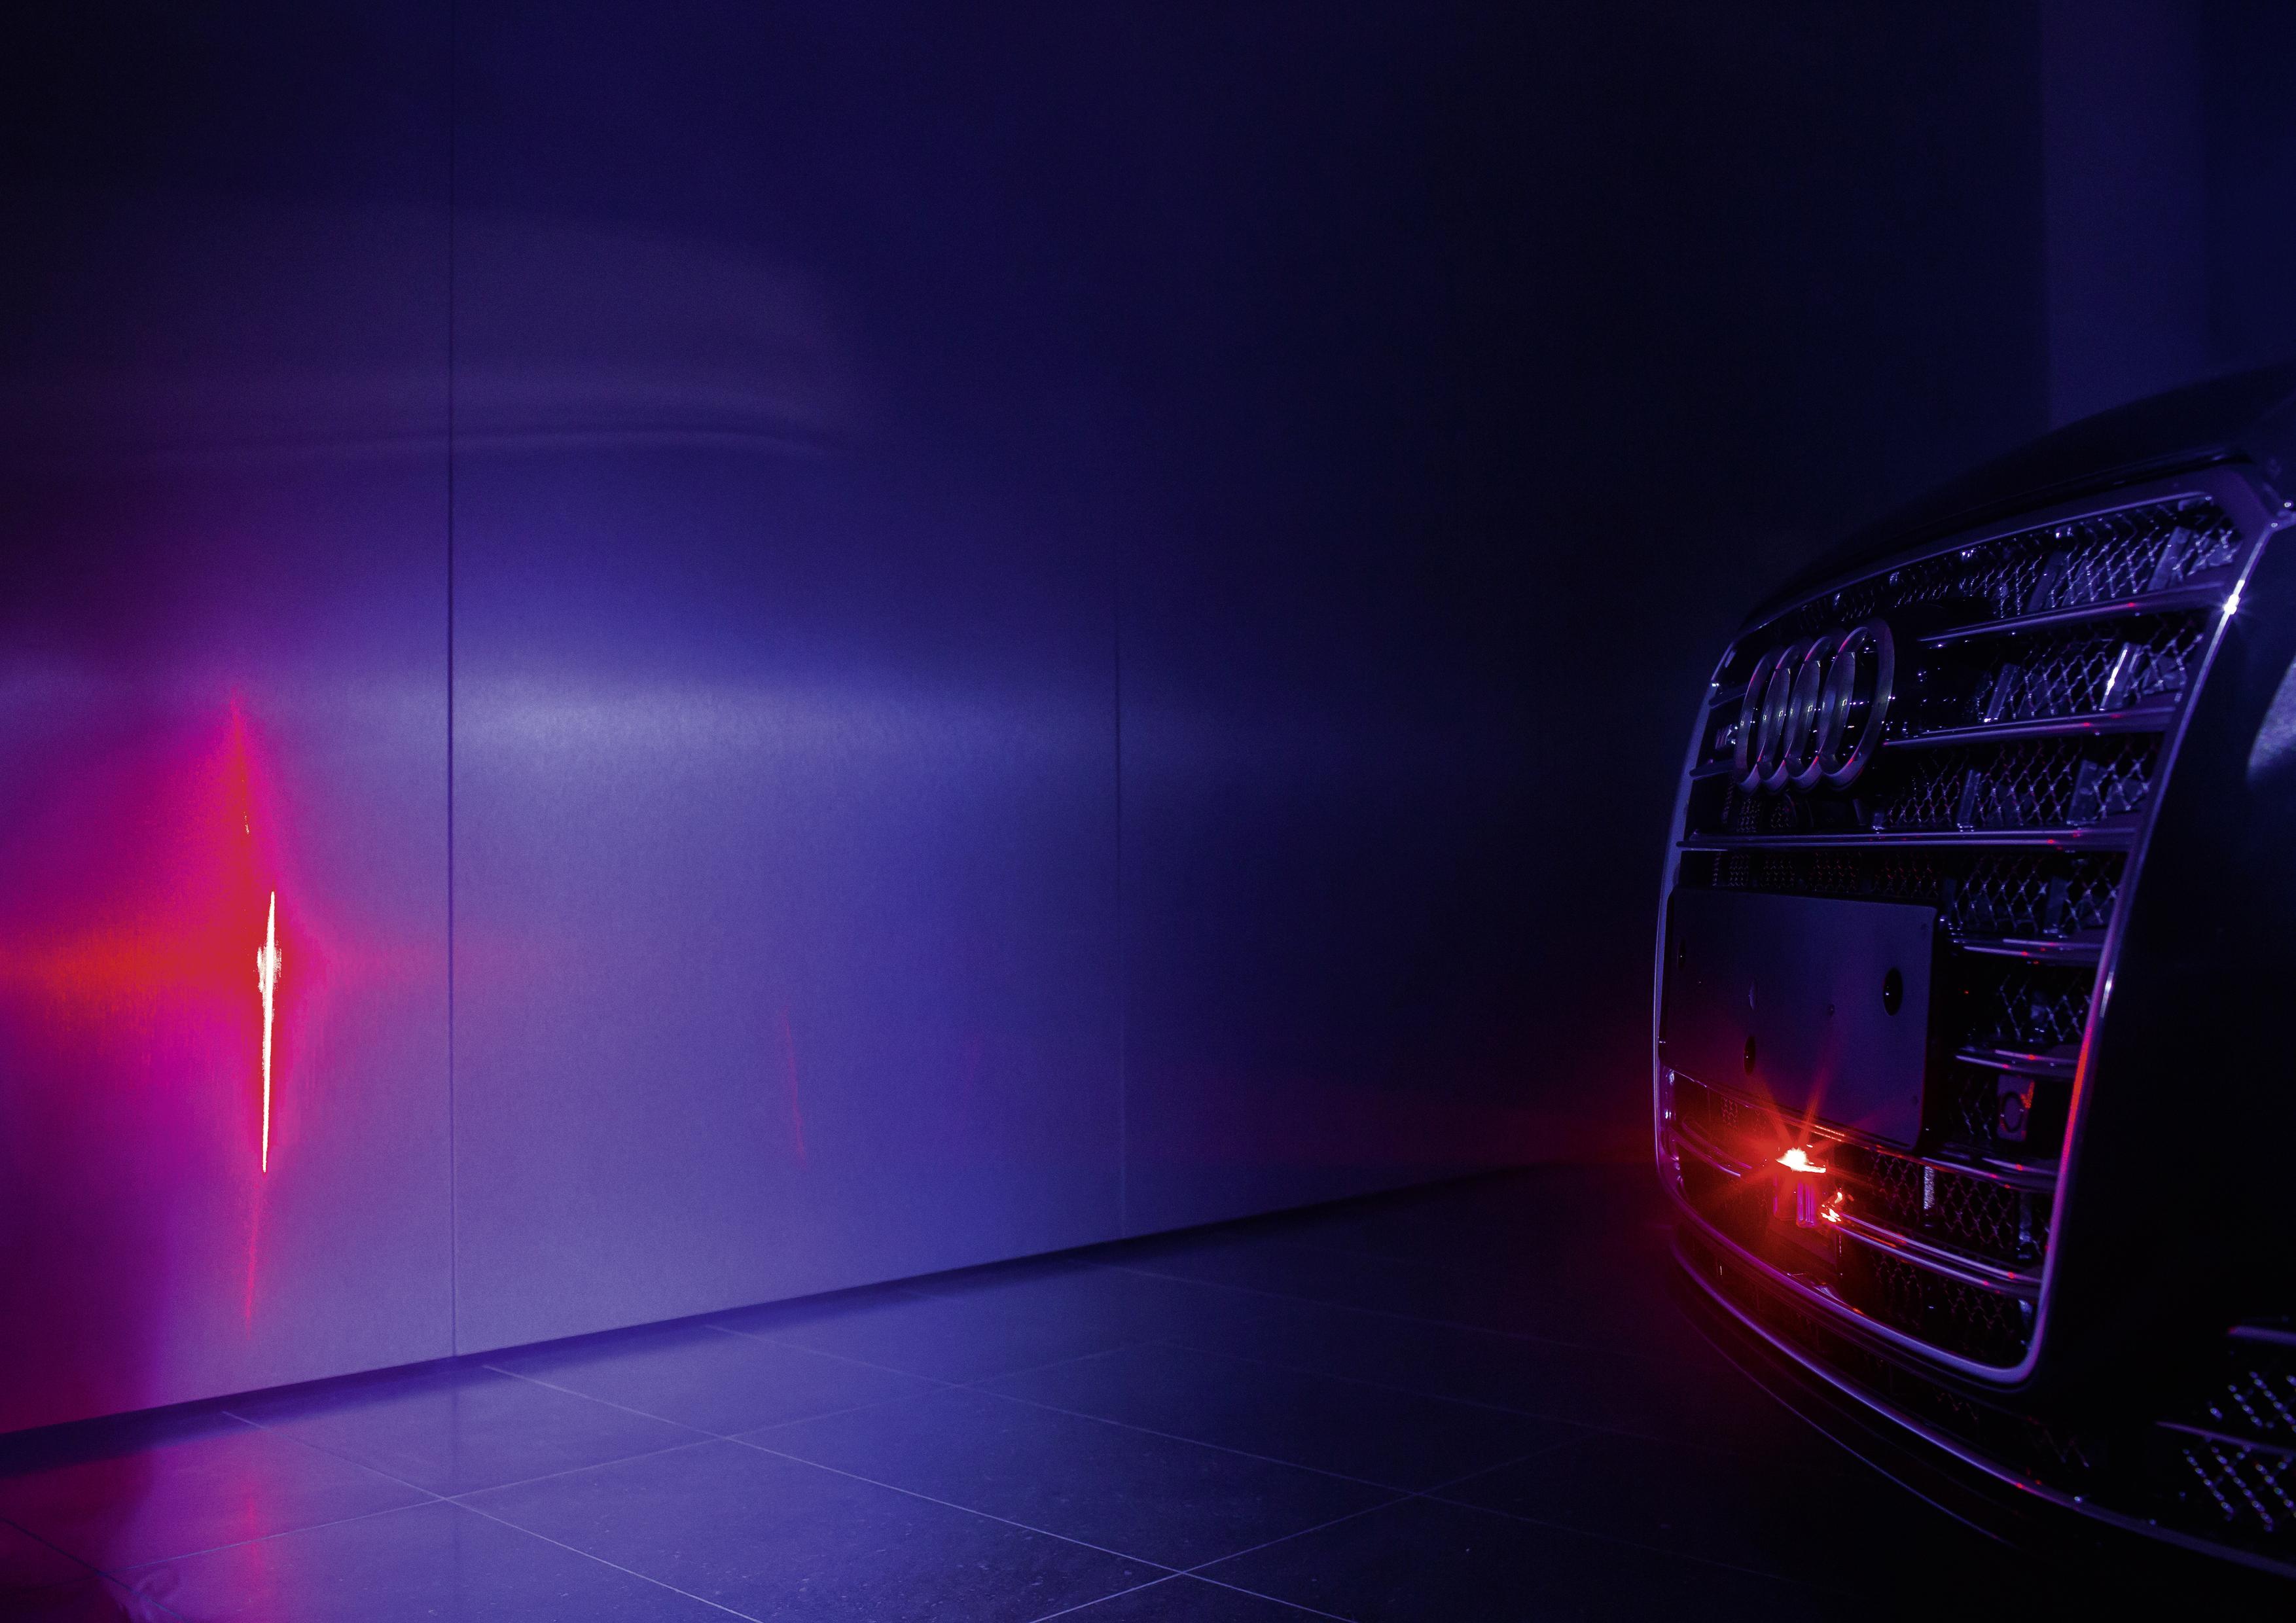 Kaleas Profi Laser Entfernungsmesser Ldm 500 60 Preis : Laser abstandsmesser show